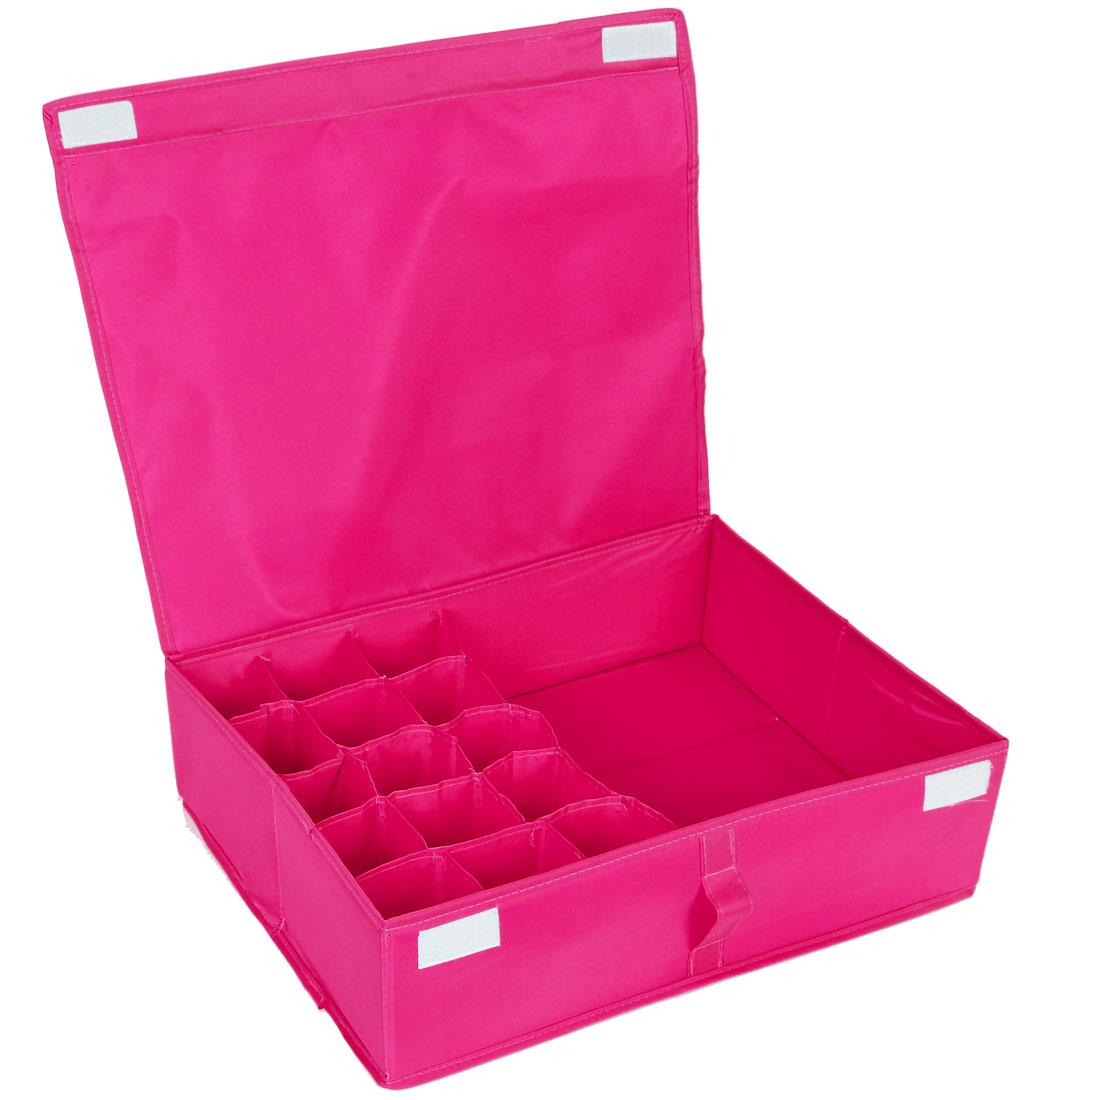 Clothes Briefs Underwear 16 Compartments Organizer Storage Box Bag Fuchsia